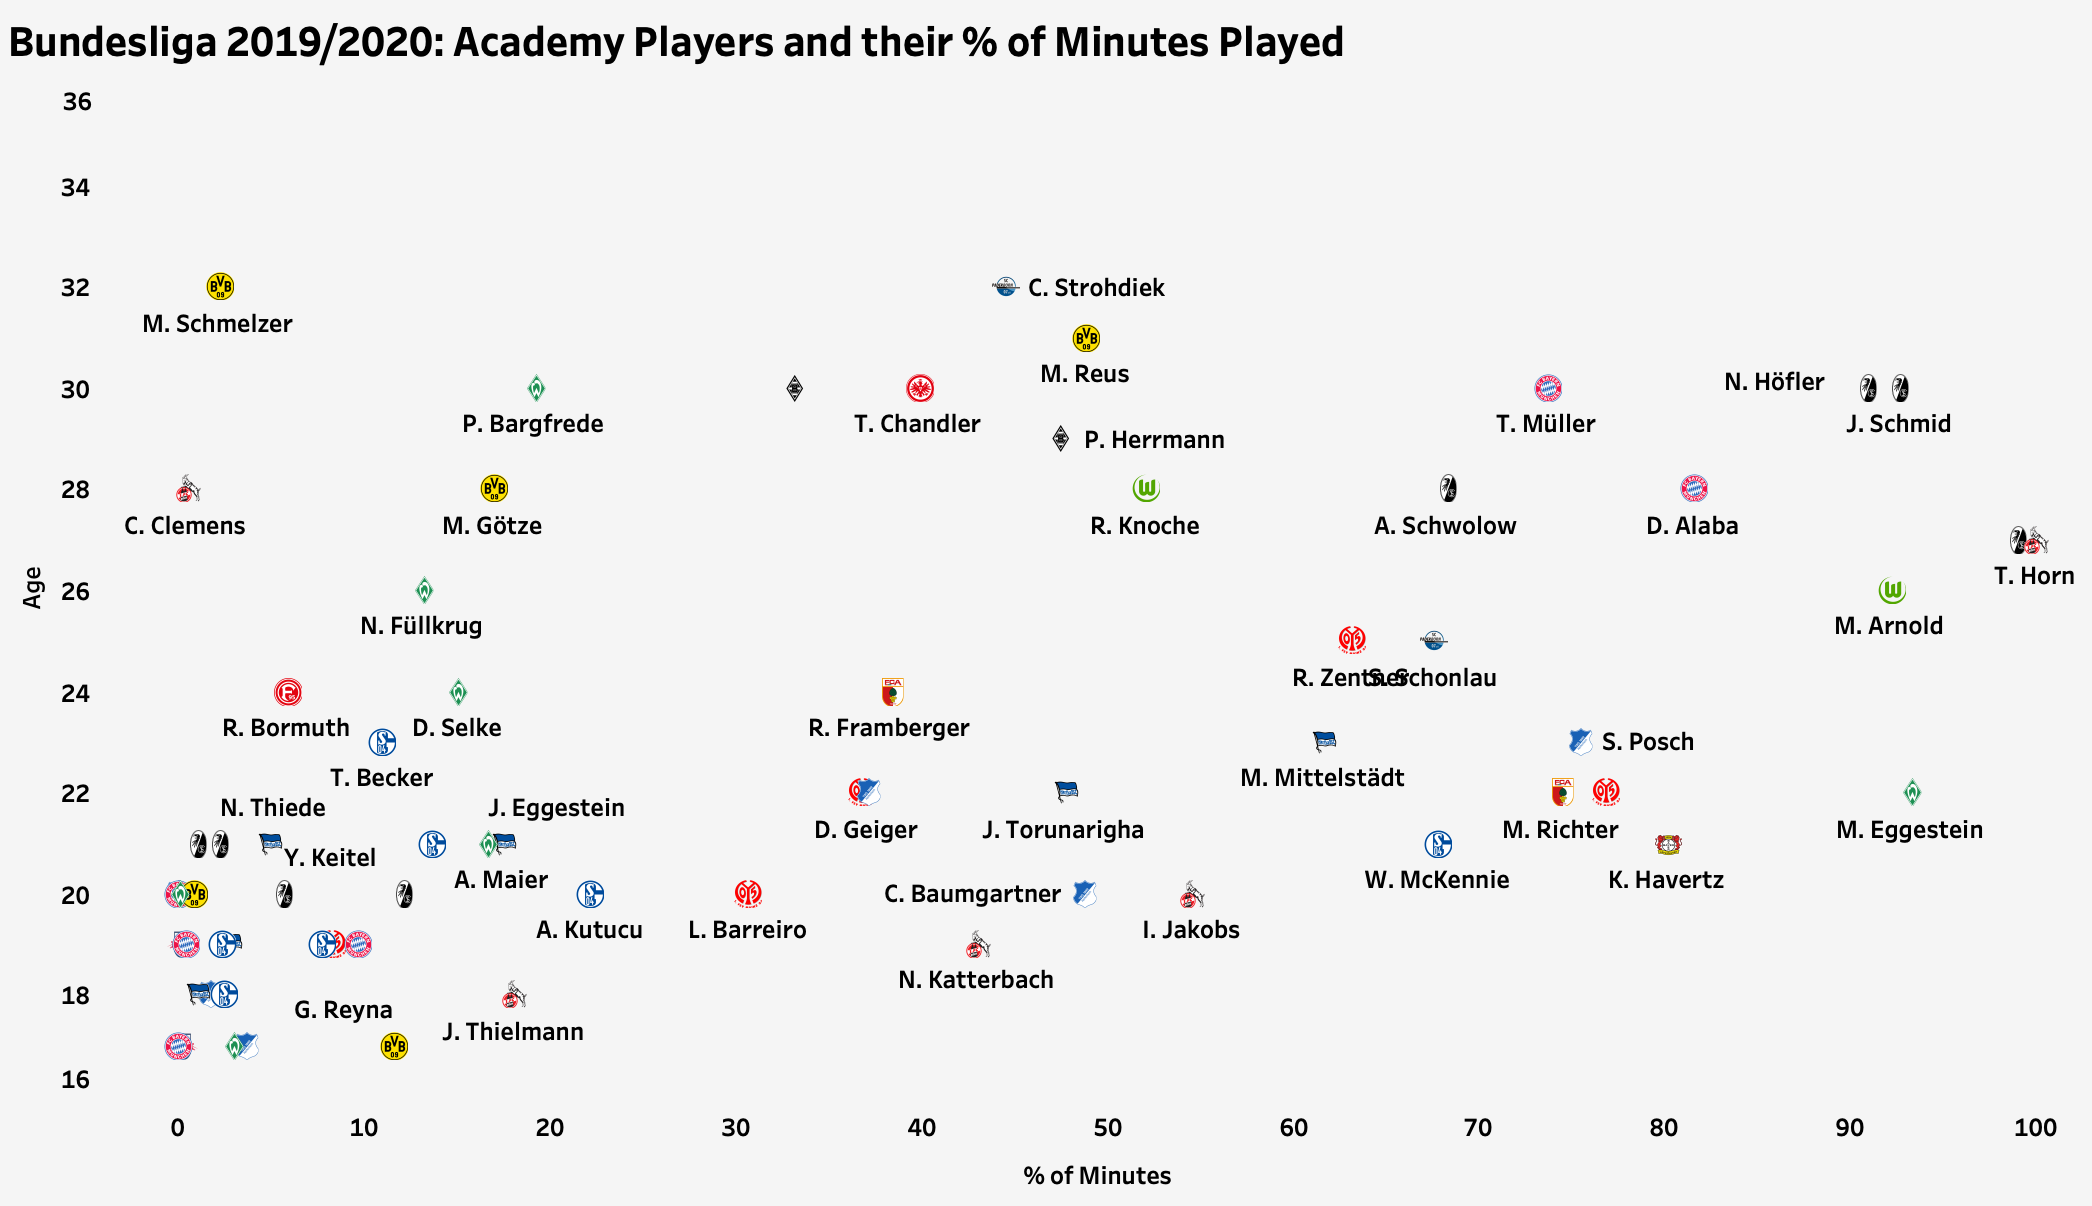 Academy players in the Bundesliga 2019/20 - data analysis statistics